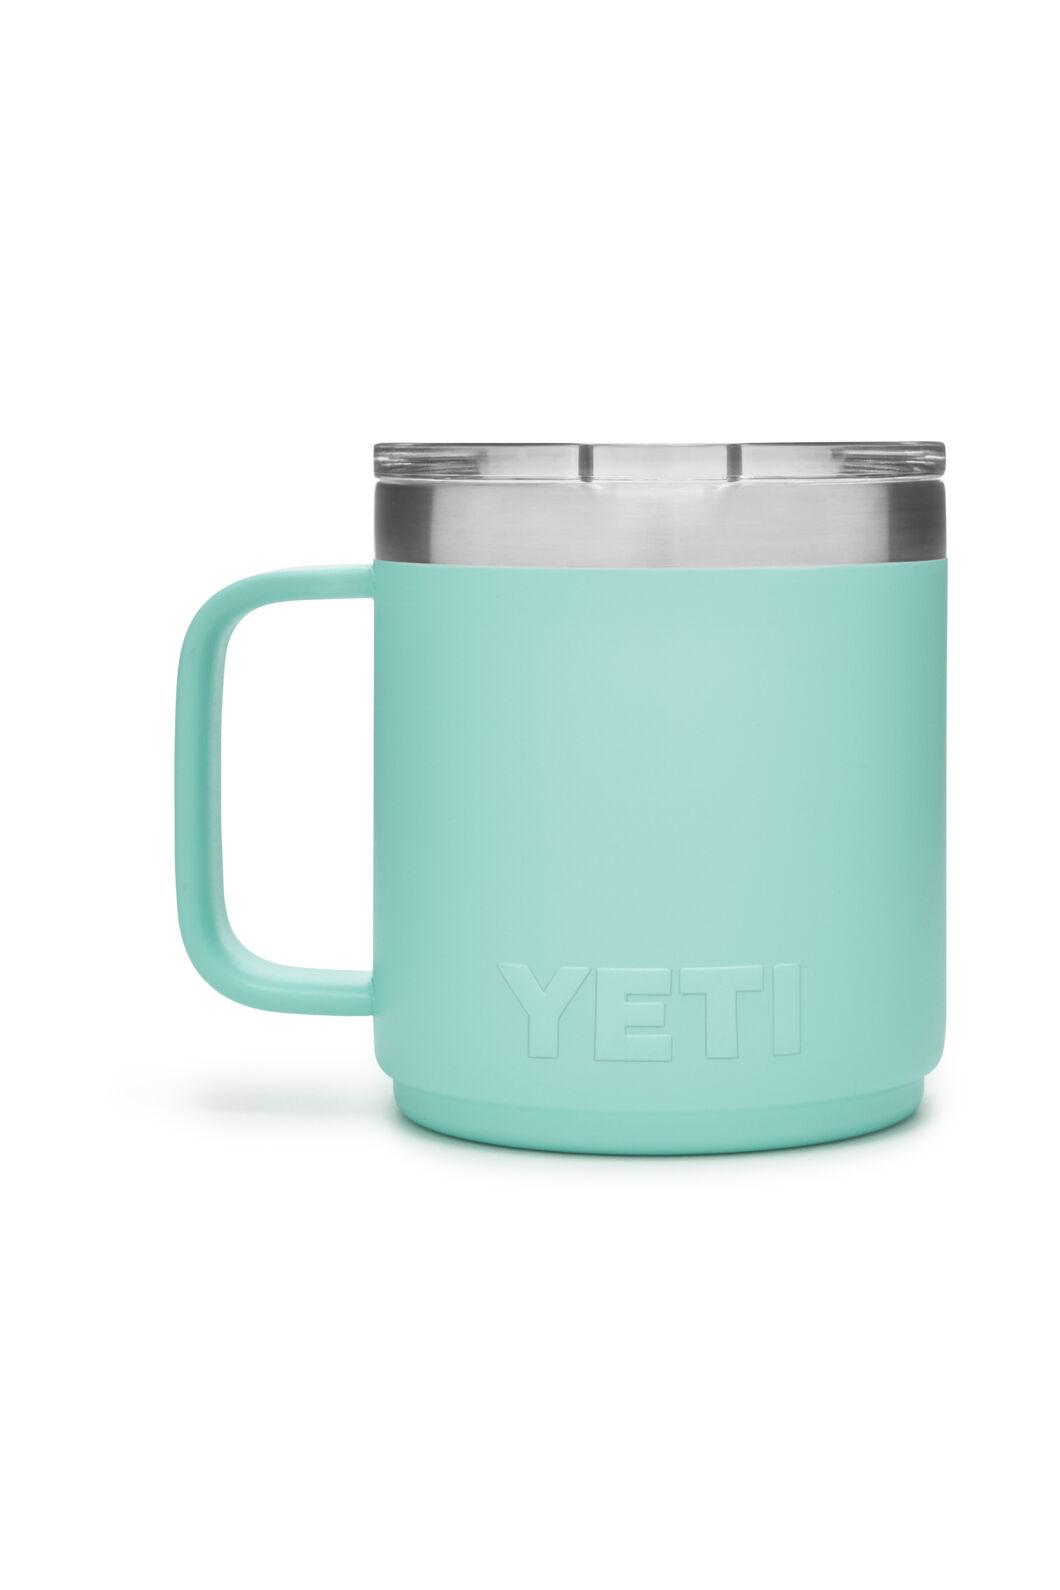 YETI® Rambler 10 oz Stackable Mug — 295 ml, SEAFOAM, hi-res